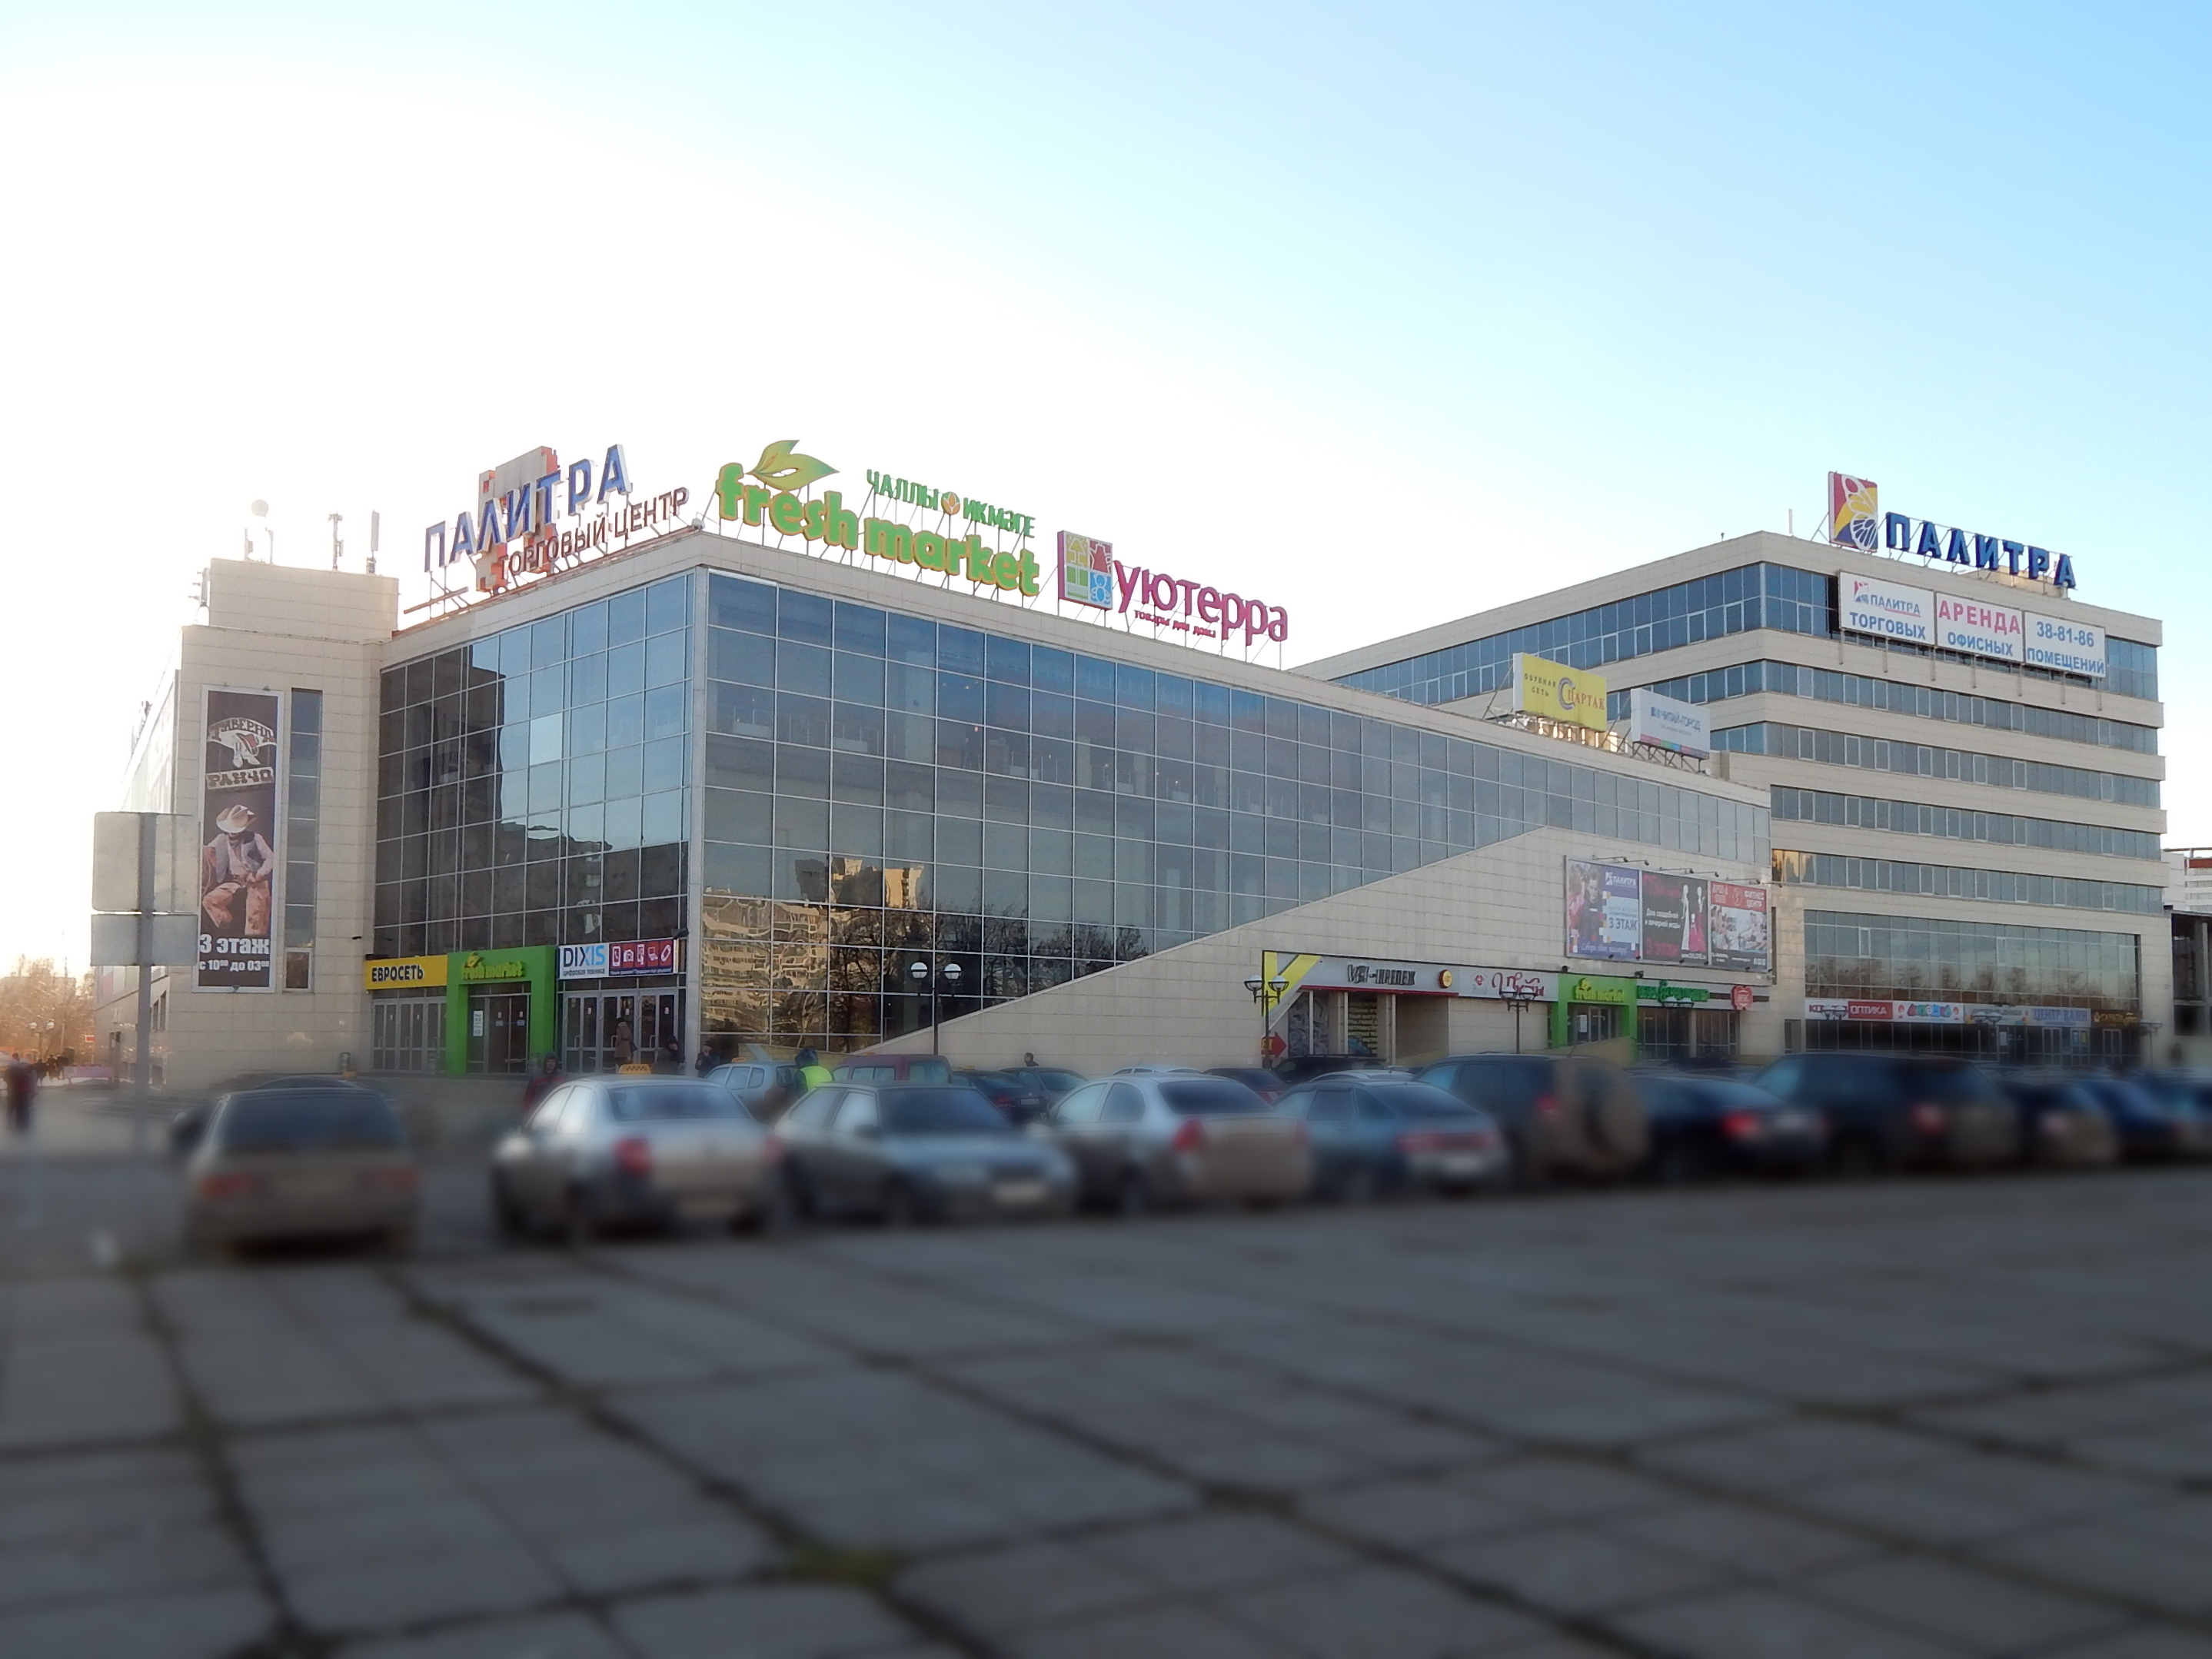 Палитра, торговый центр